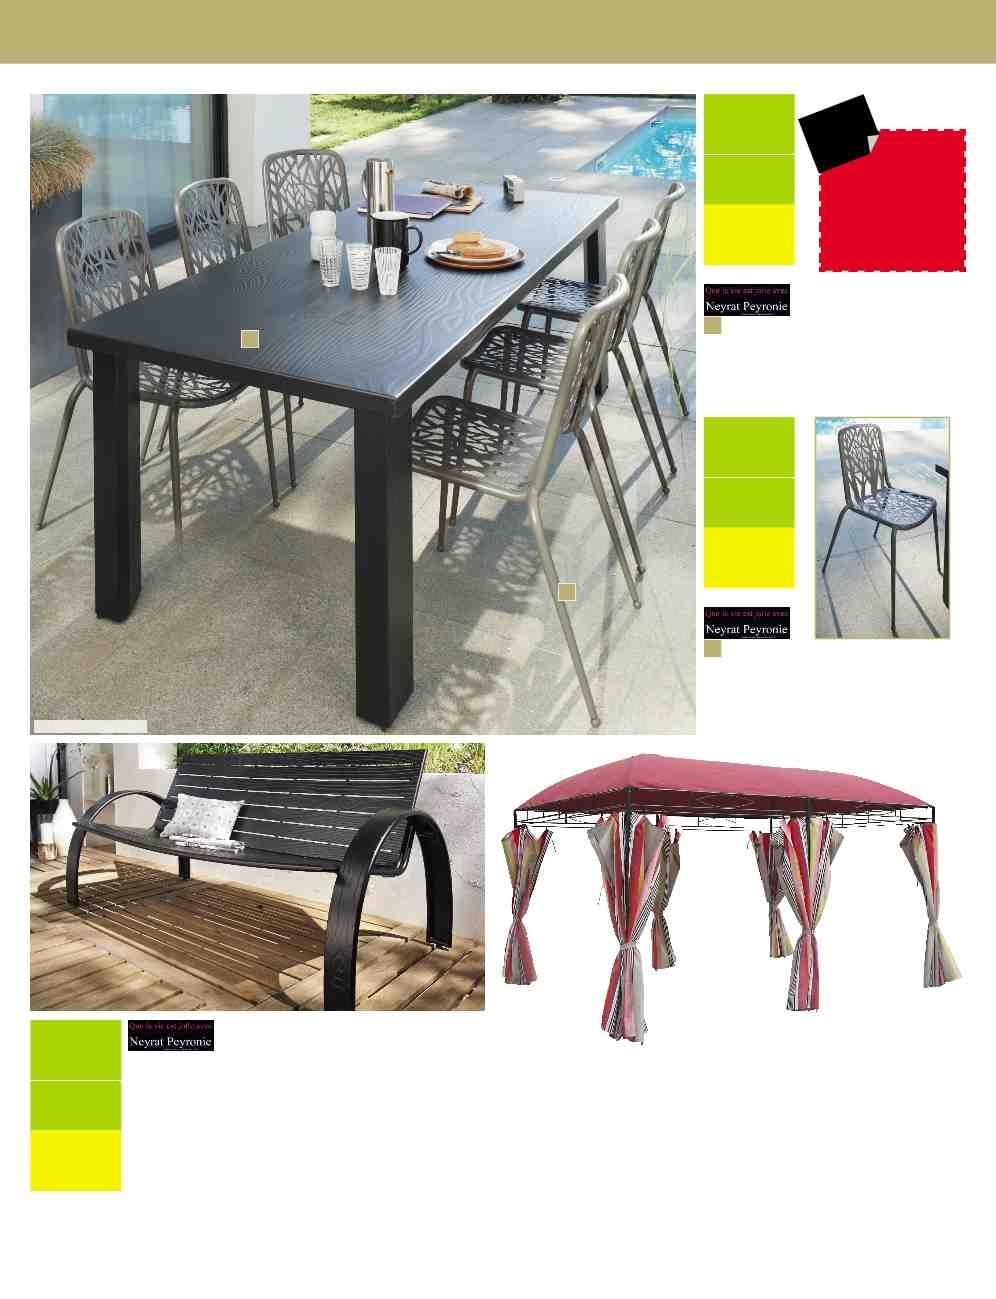 De Intermarche Veranda Jardin Chaise De Chaise Jardin fIgybYv76